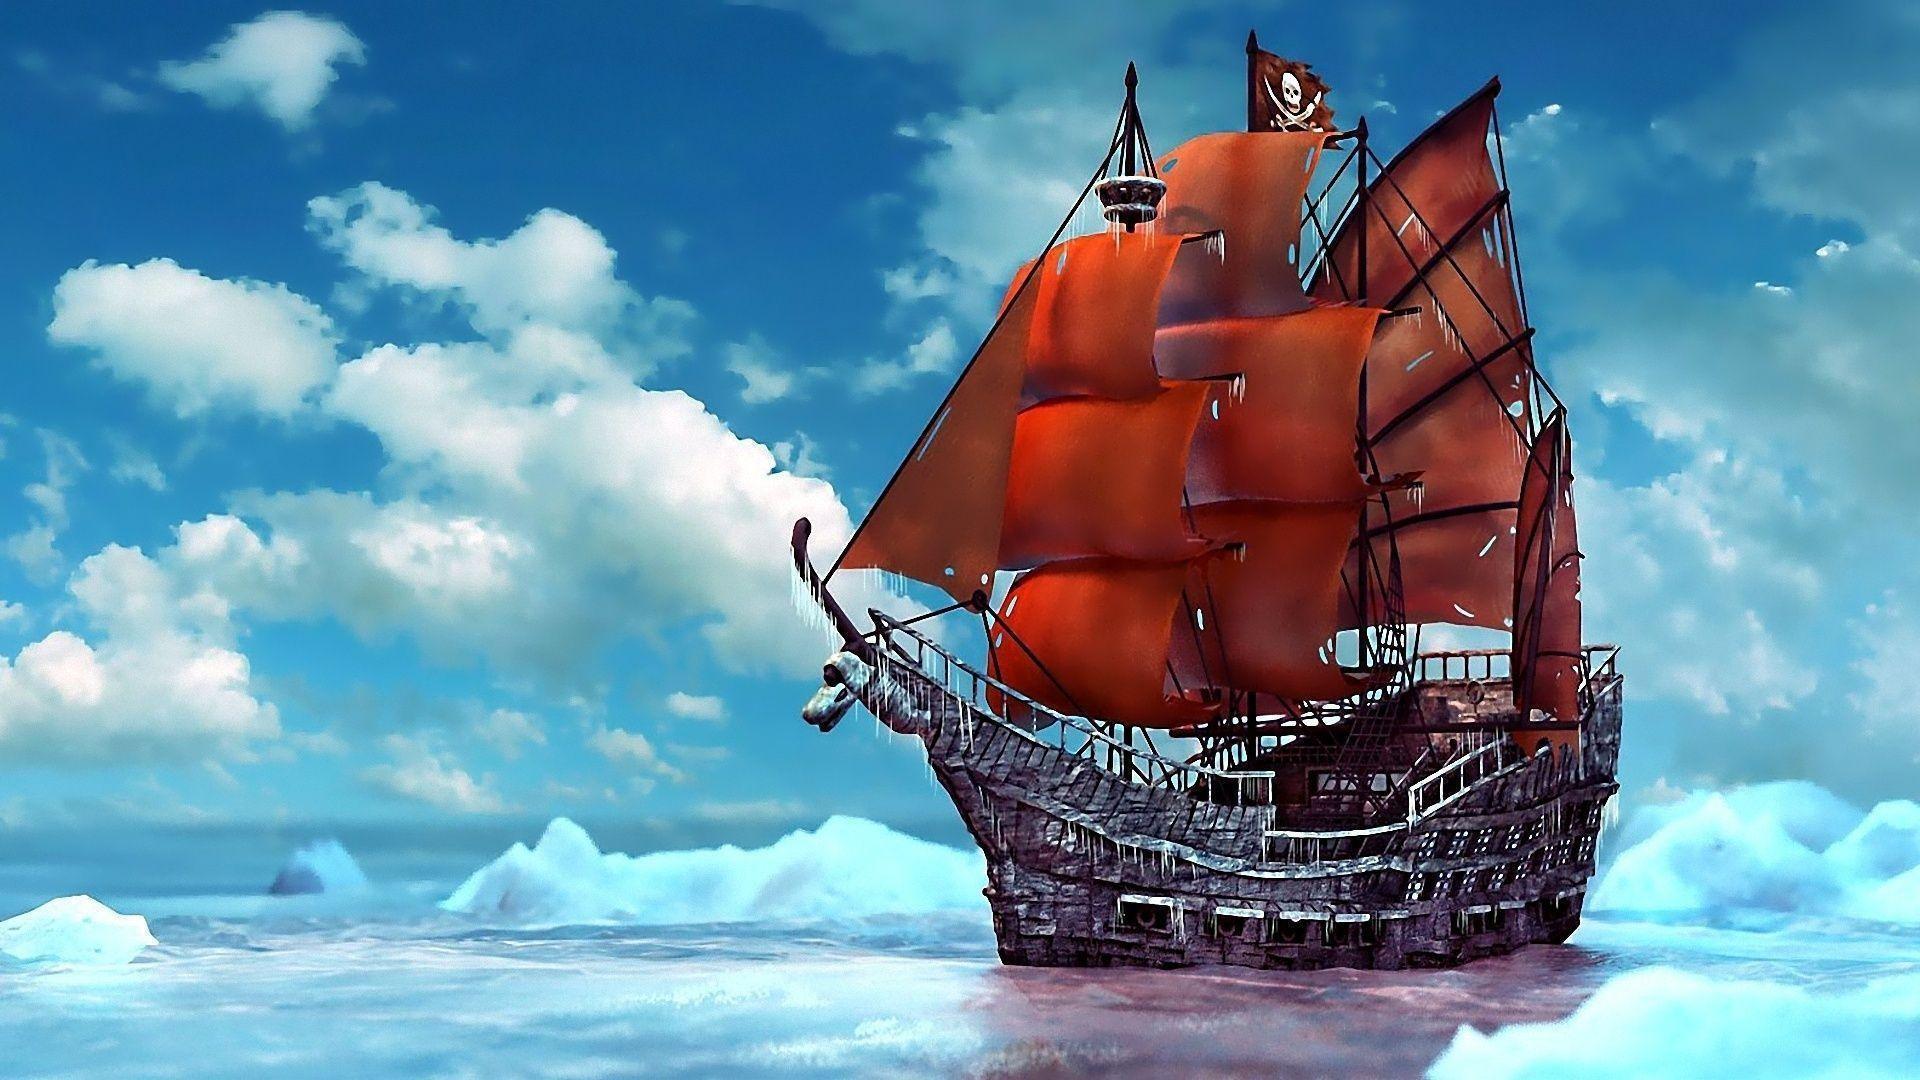 Pirate ship iphone wallpaper - photo#54